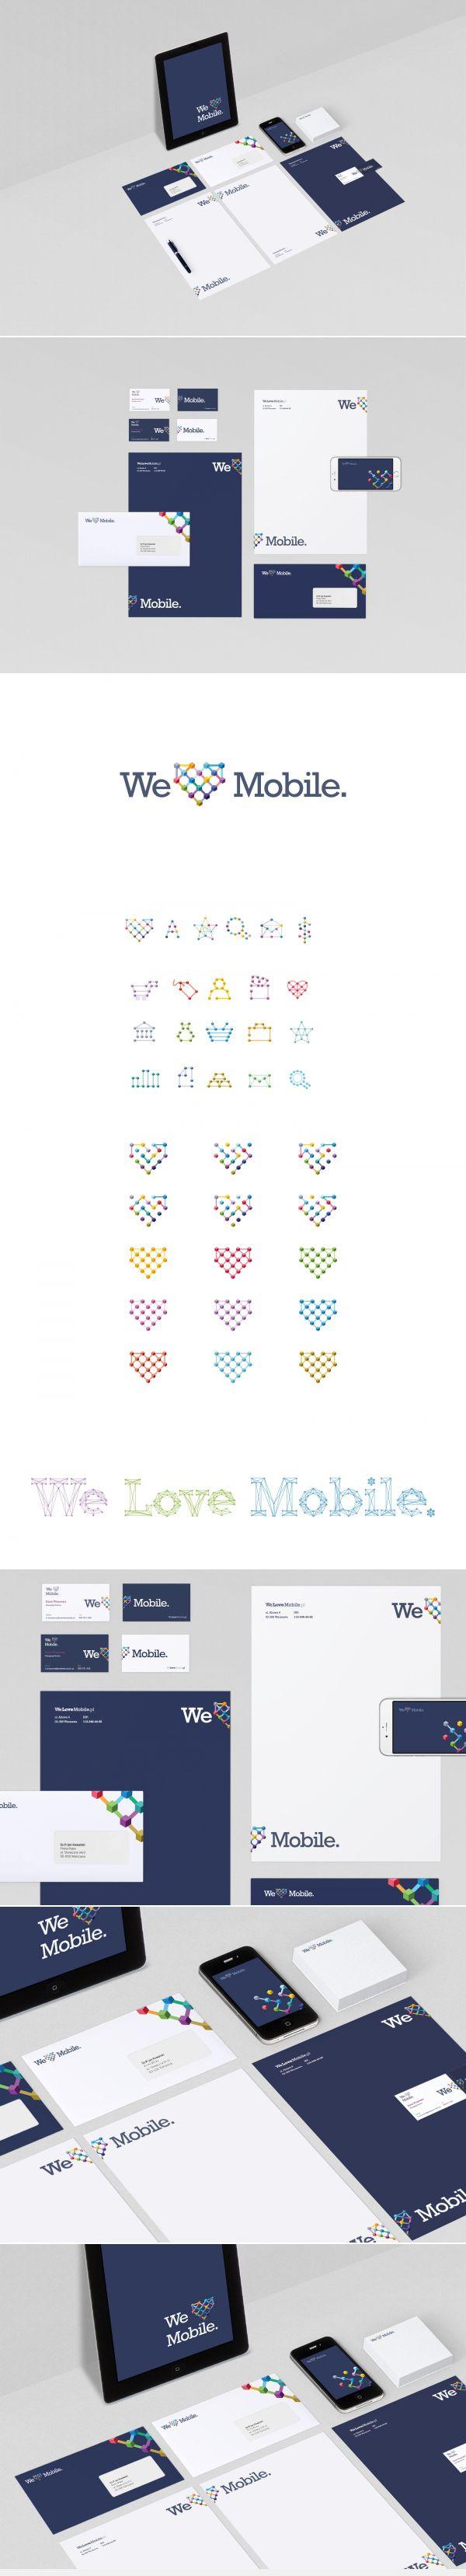 We Love Affiliate Logo and Brand Design | Kommunikat